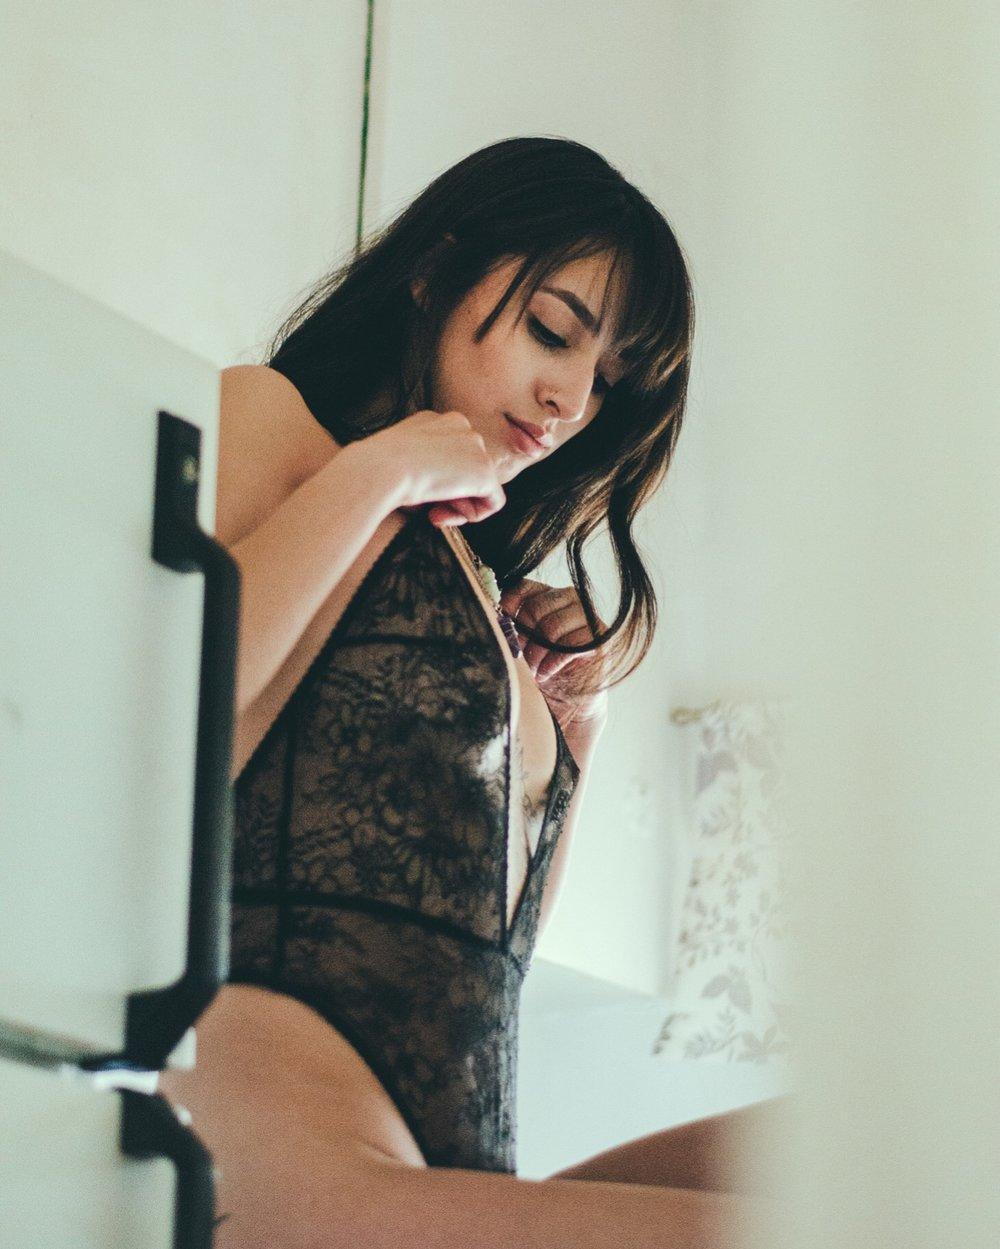 GABRIELLE ORTIZ | MODEL